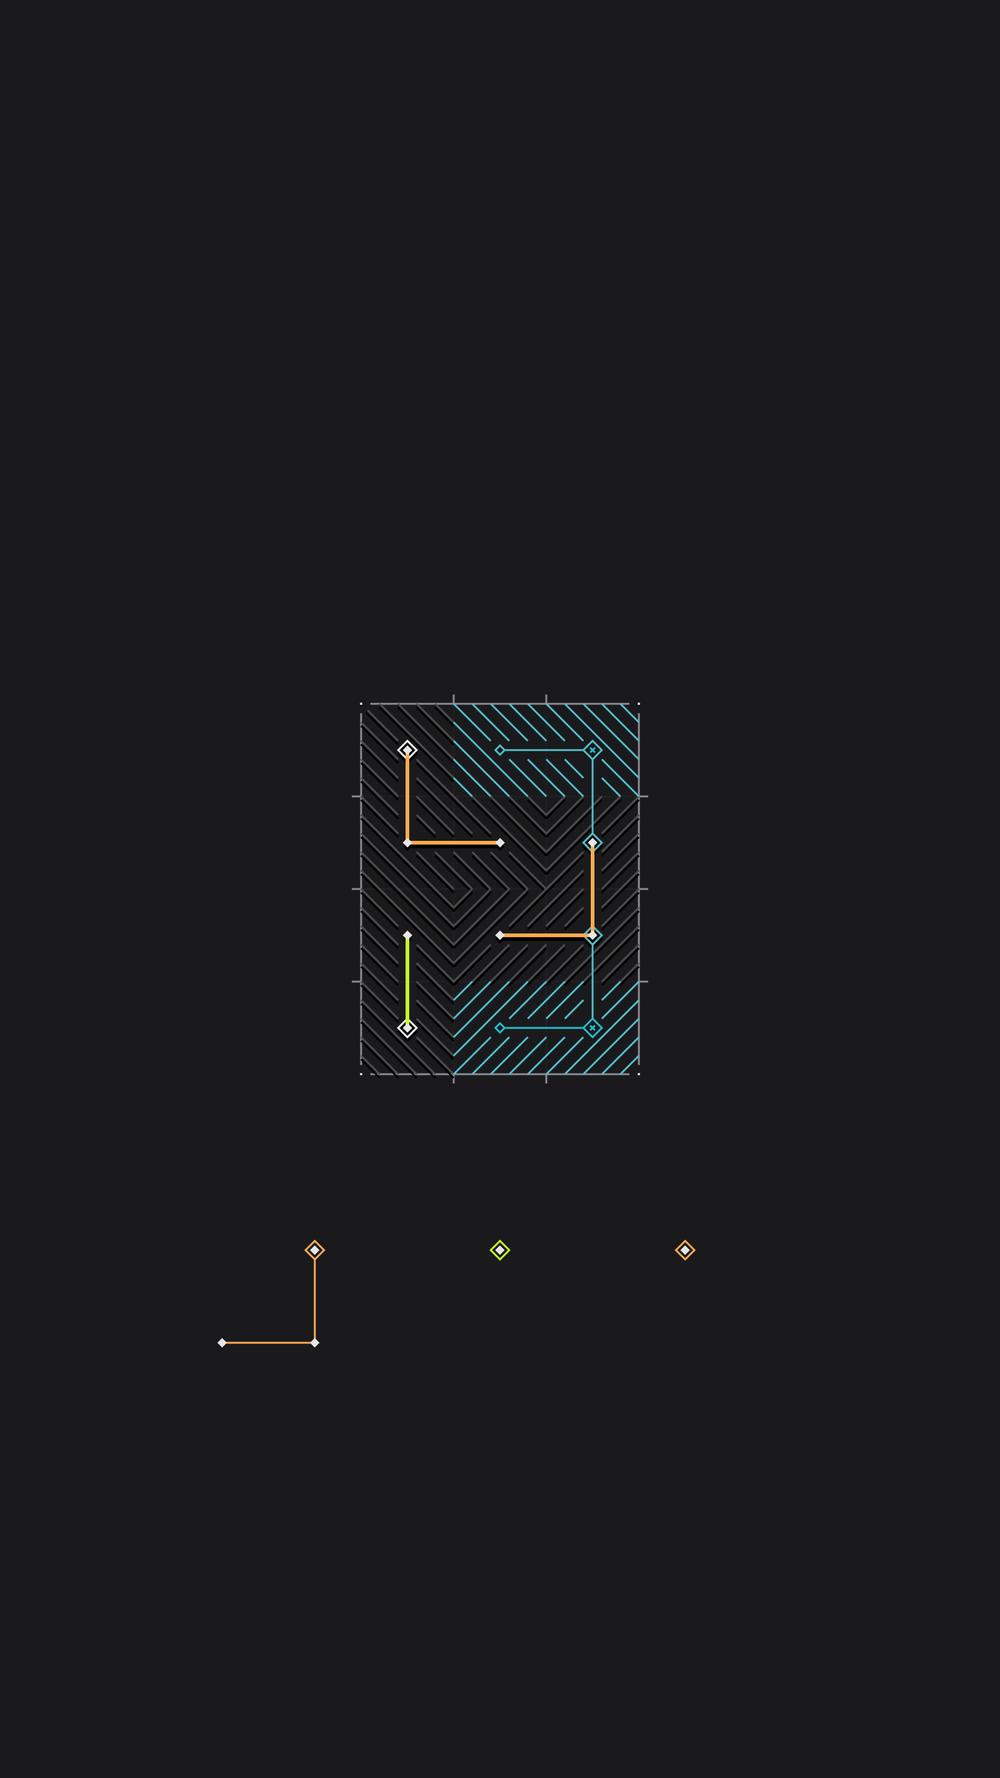 puzzle-depth-23.png